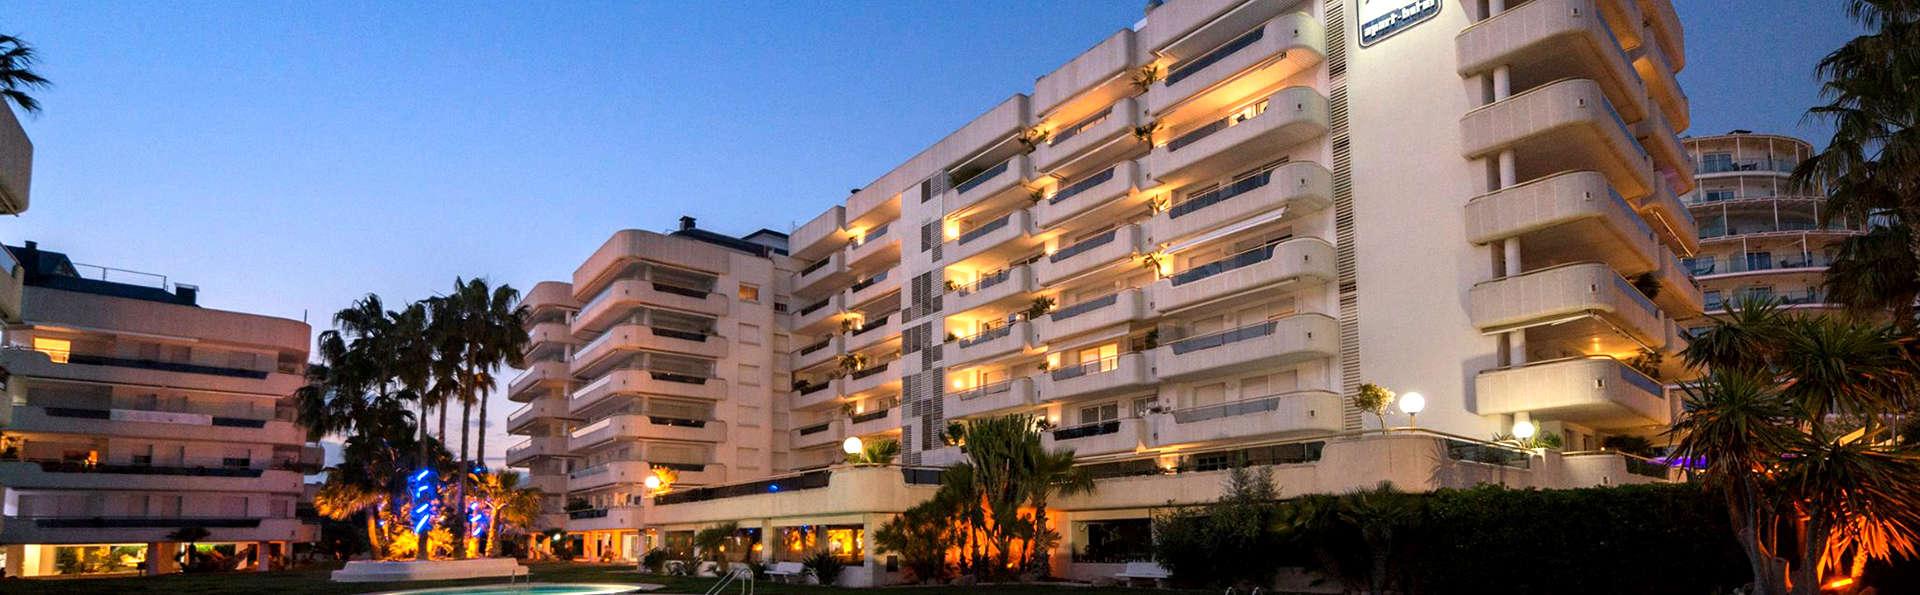 Mediterraneo Sitges Apartments - Edit_Front.jpg